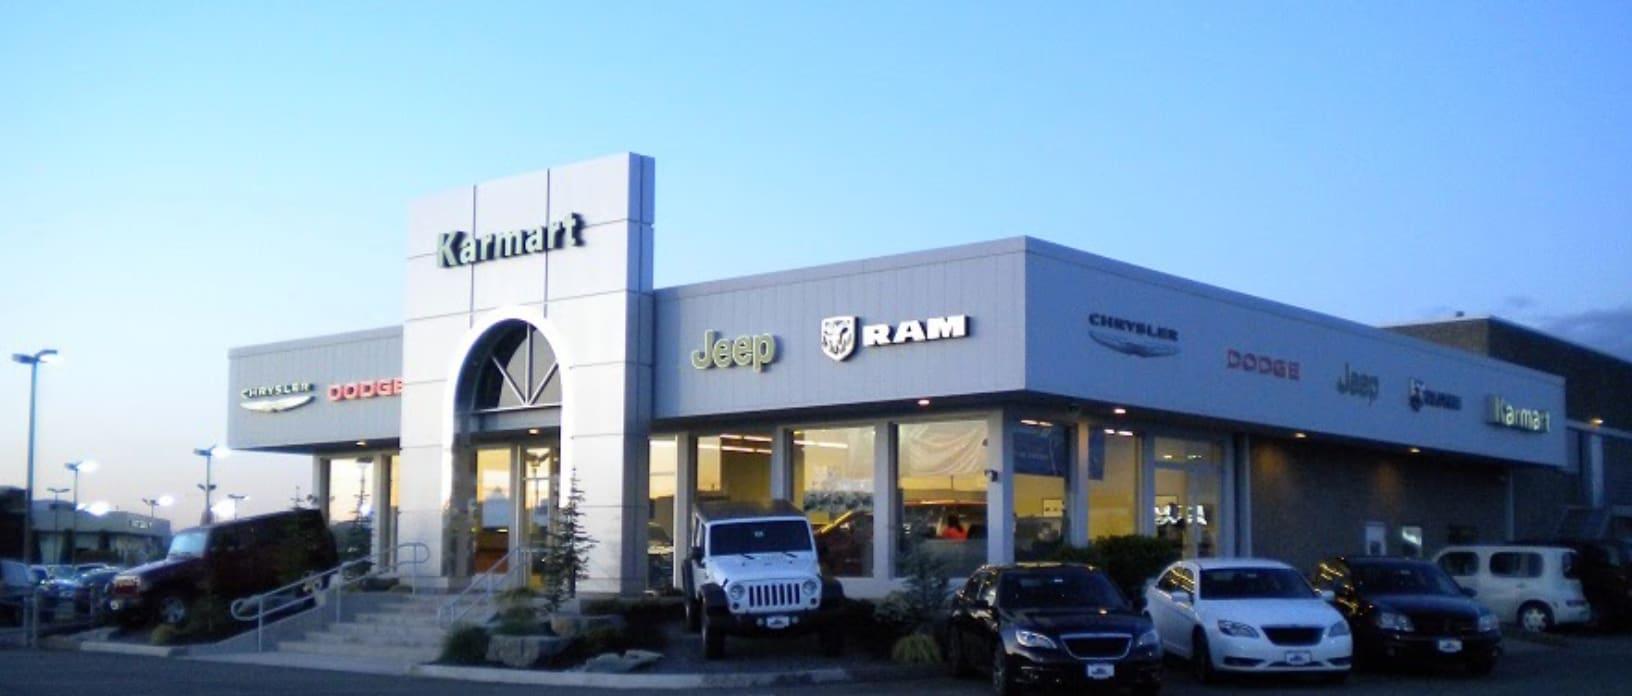 Chrysler Jeep Dodge Ram FIAT Dealership   KarMART CJDRF